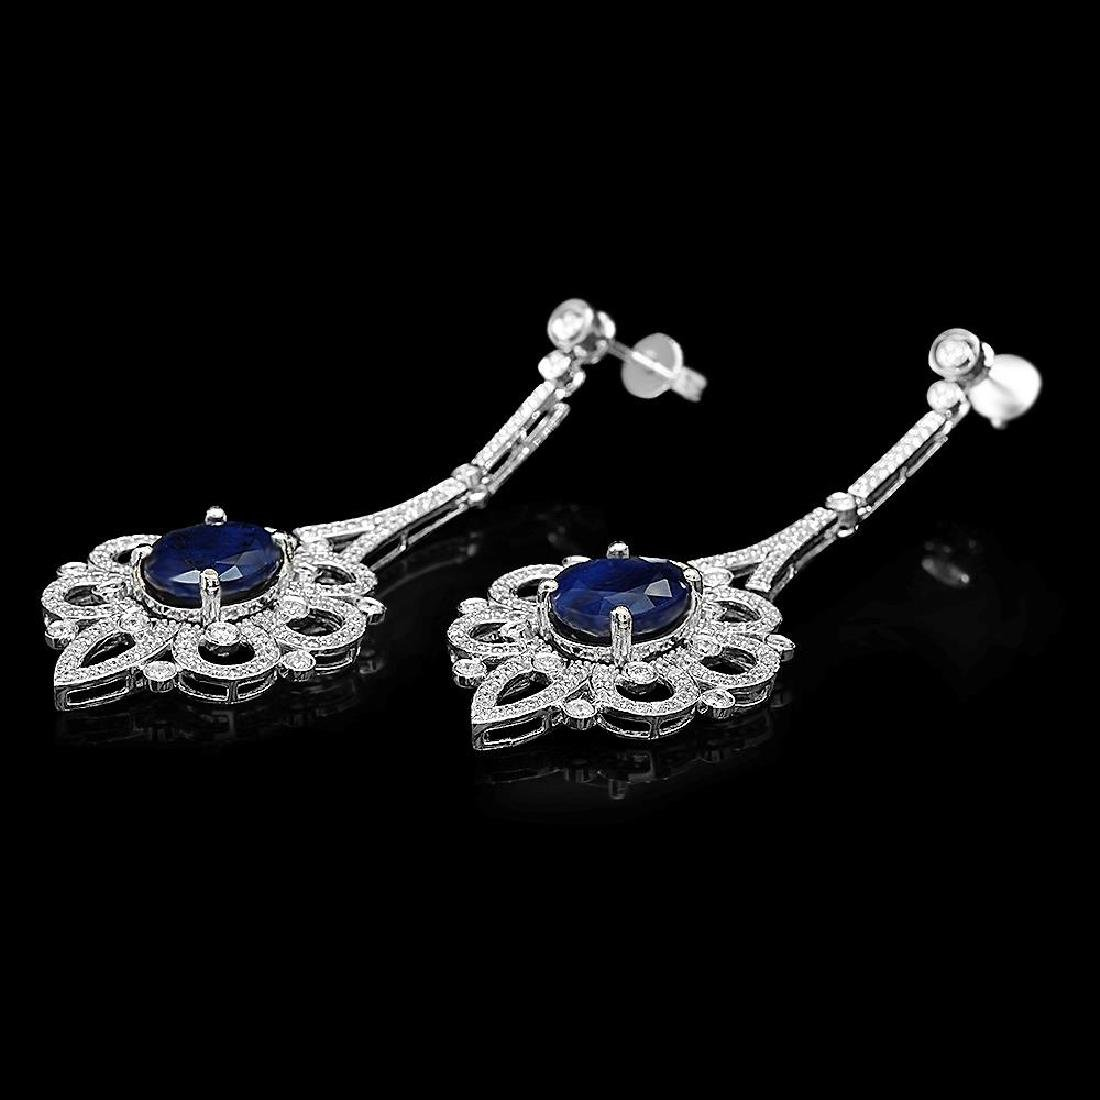 18K Gold 13.64ct Sapphire 4.08ct Diamond Earrings - 2